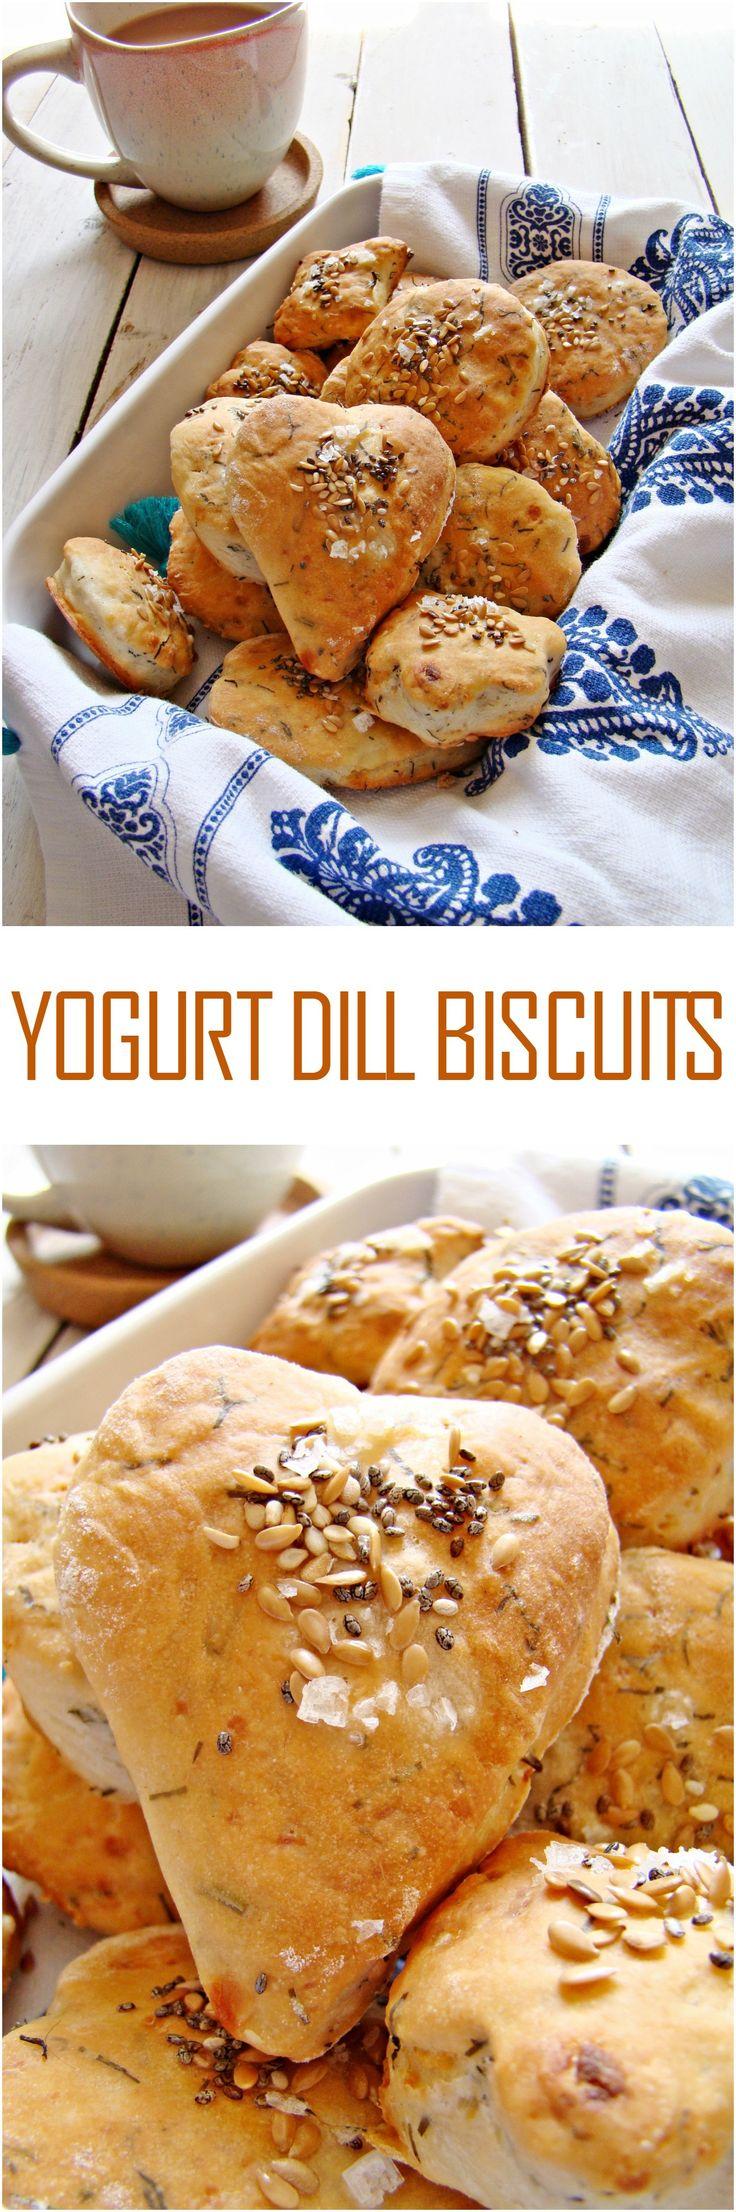 Yogurt Dill Biscuits